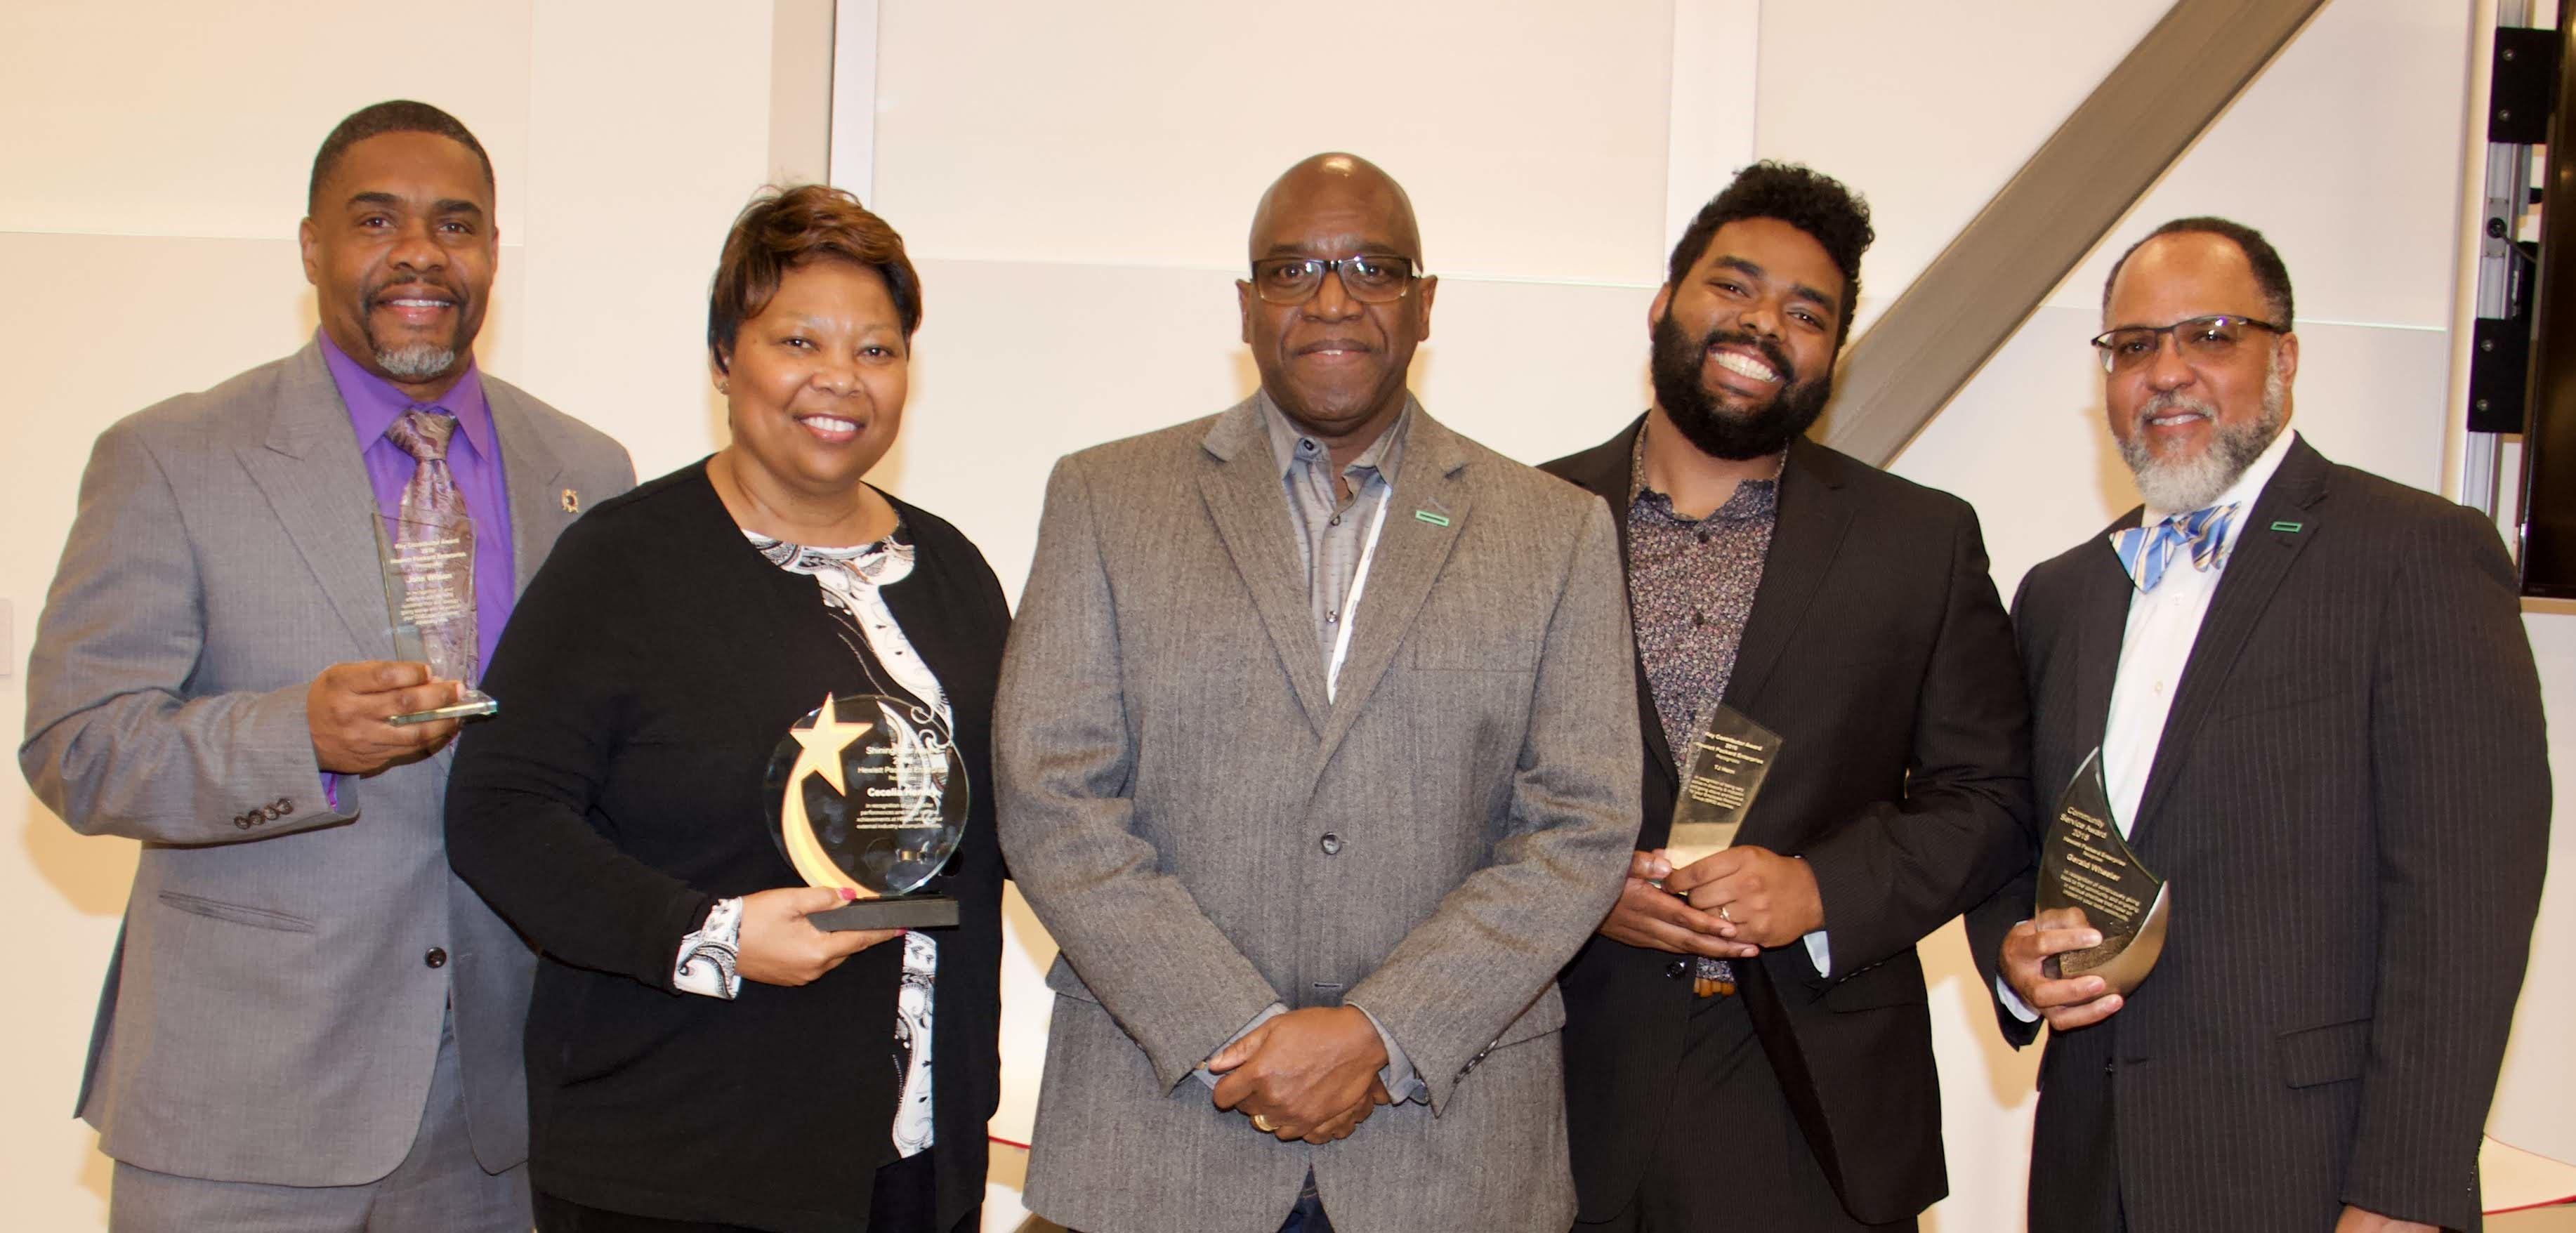 Atlanta Black History Month Award Winners  - John Wilson, Key Contributor; Cecelia Henley, Shining Star; TJ Helm, Key Contributor; Gerald Wheeler, Community Service